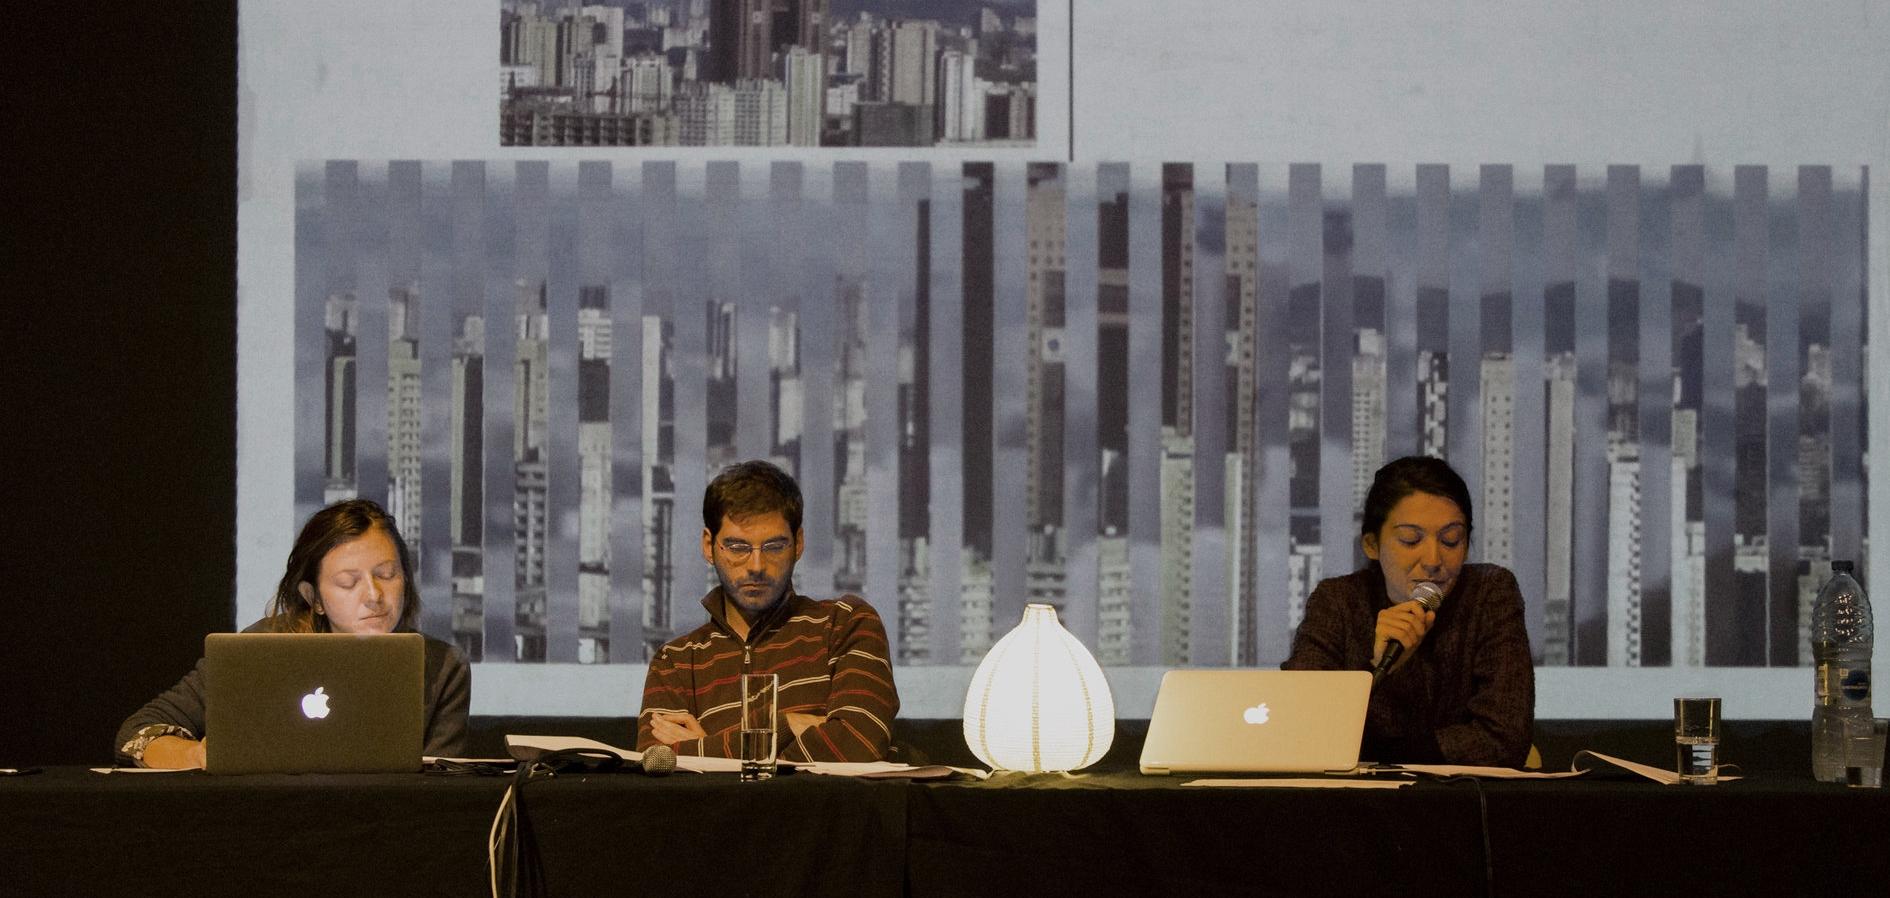 - avecLéa Rogliano, auteureQuentin Noirfalisse, journaliste d'investigationCarlotta Origoni, graphiste